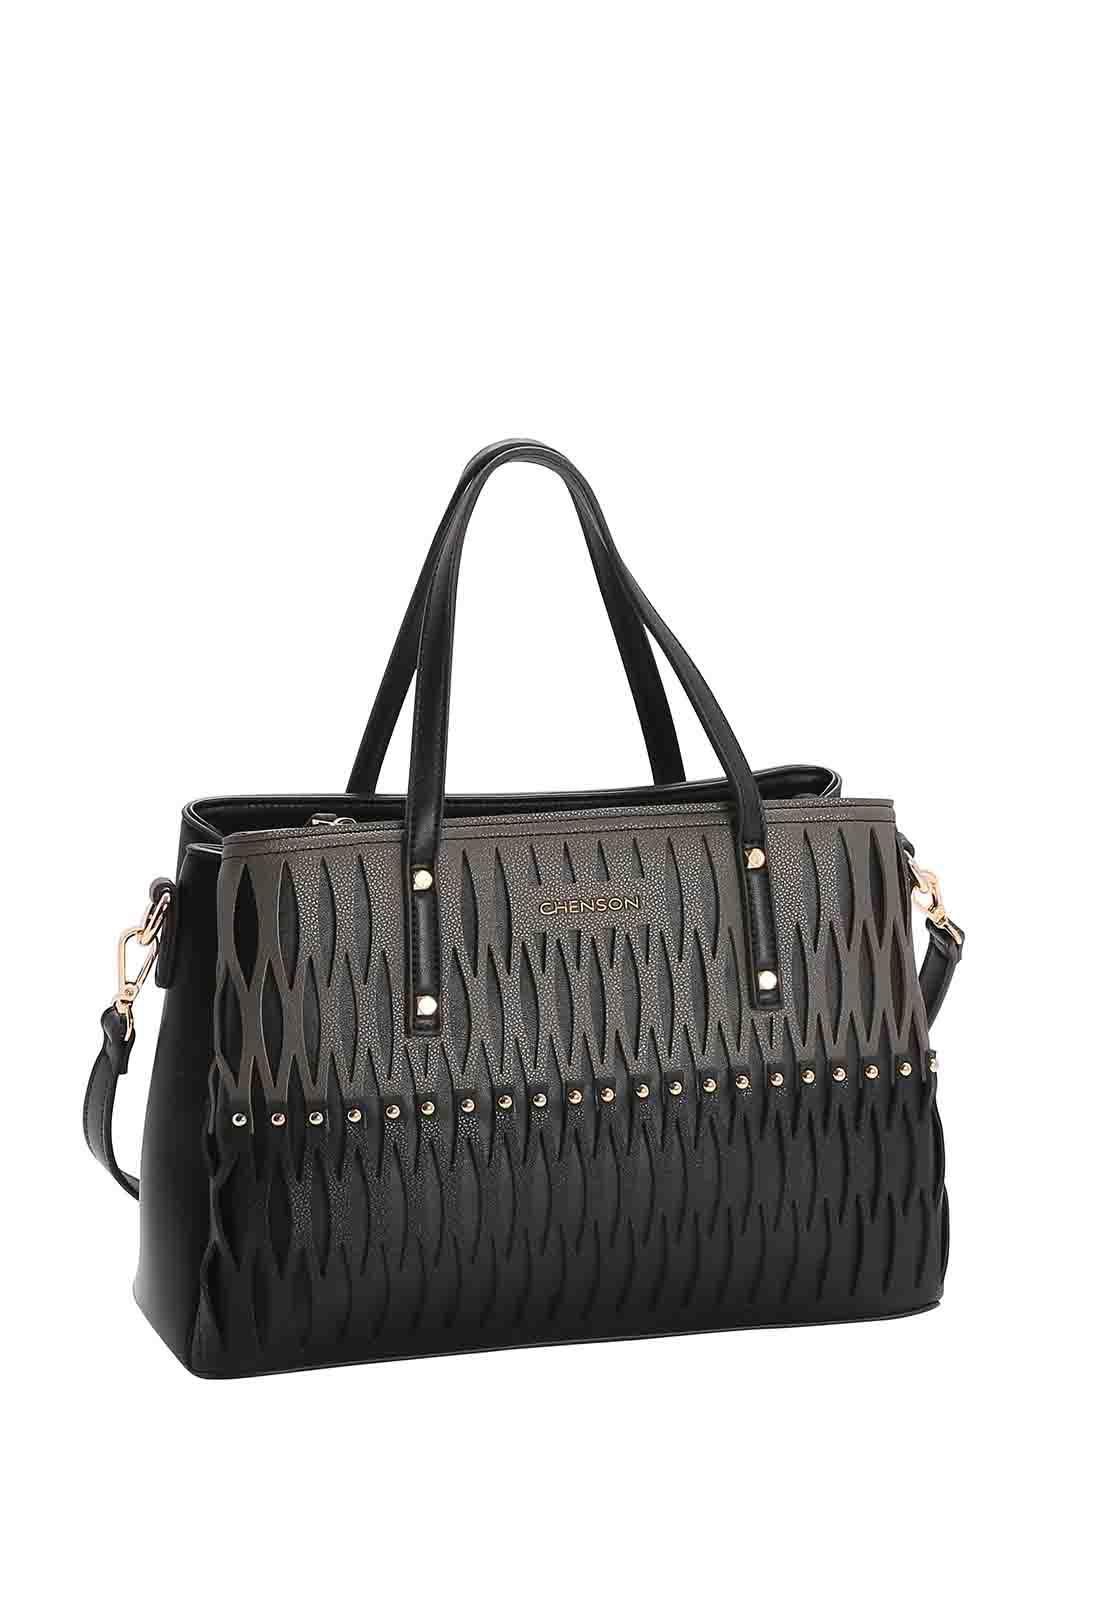 Bolsa Feminina Chenson Bicolor De Mão 3482991